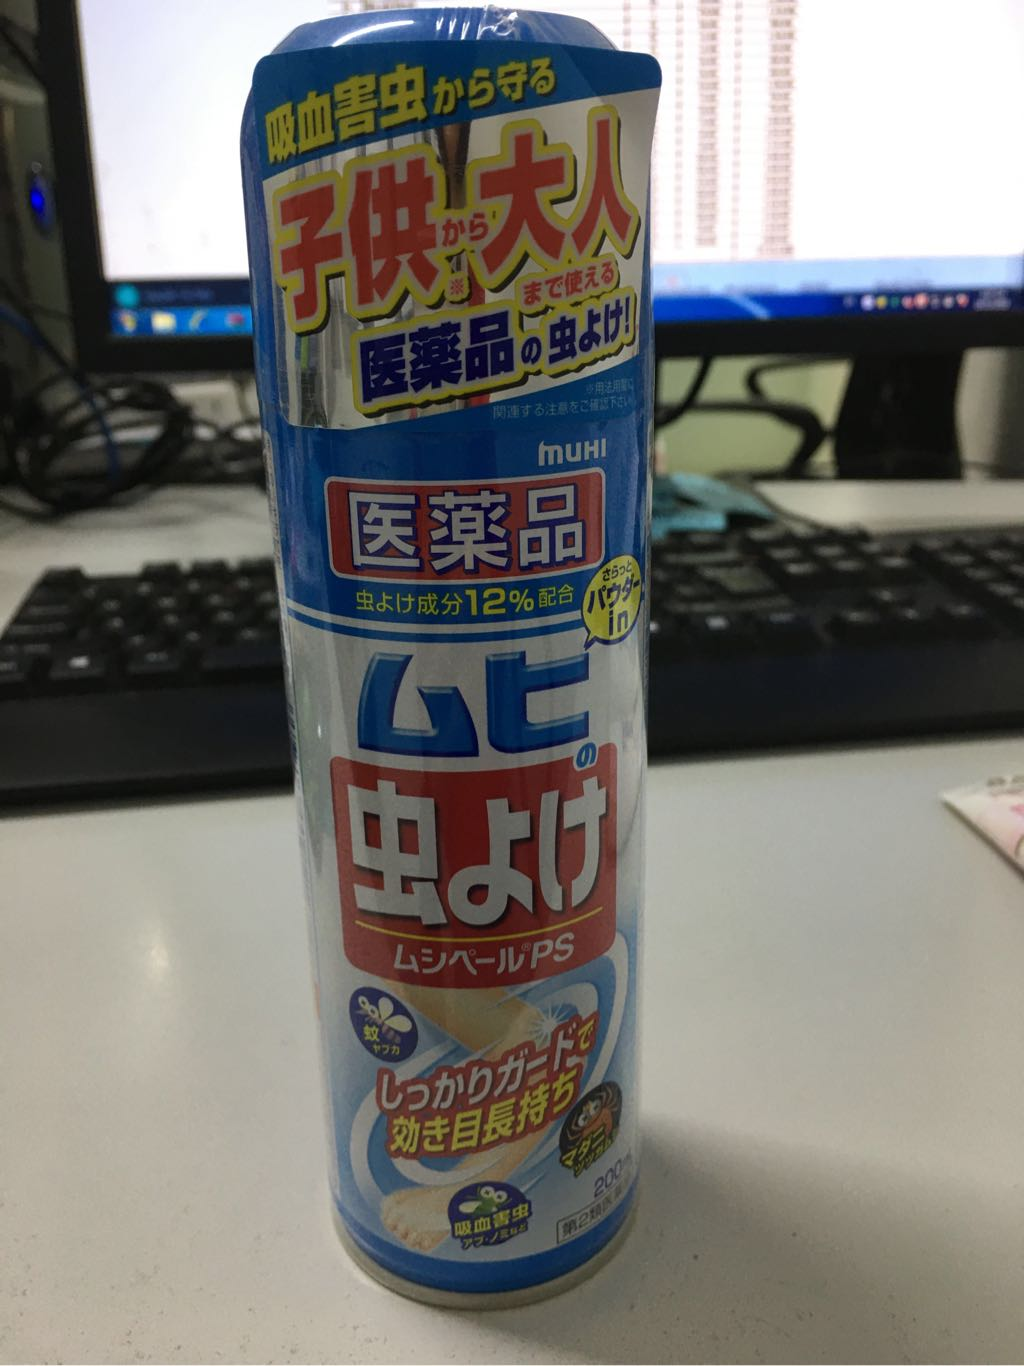 Xịt muỗi Muhi Nhật Bản 200ml